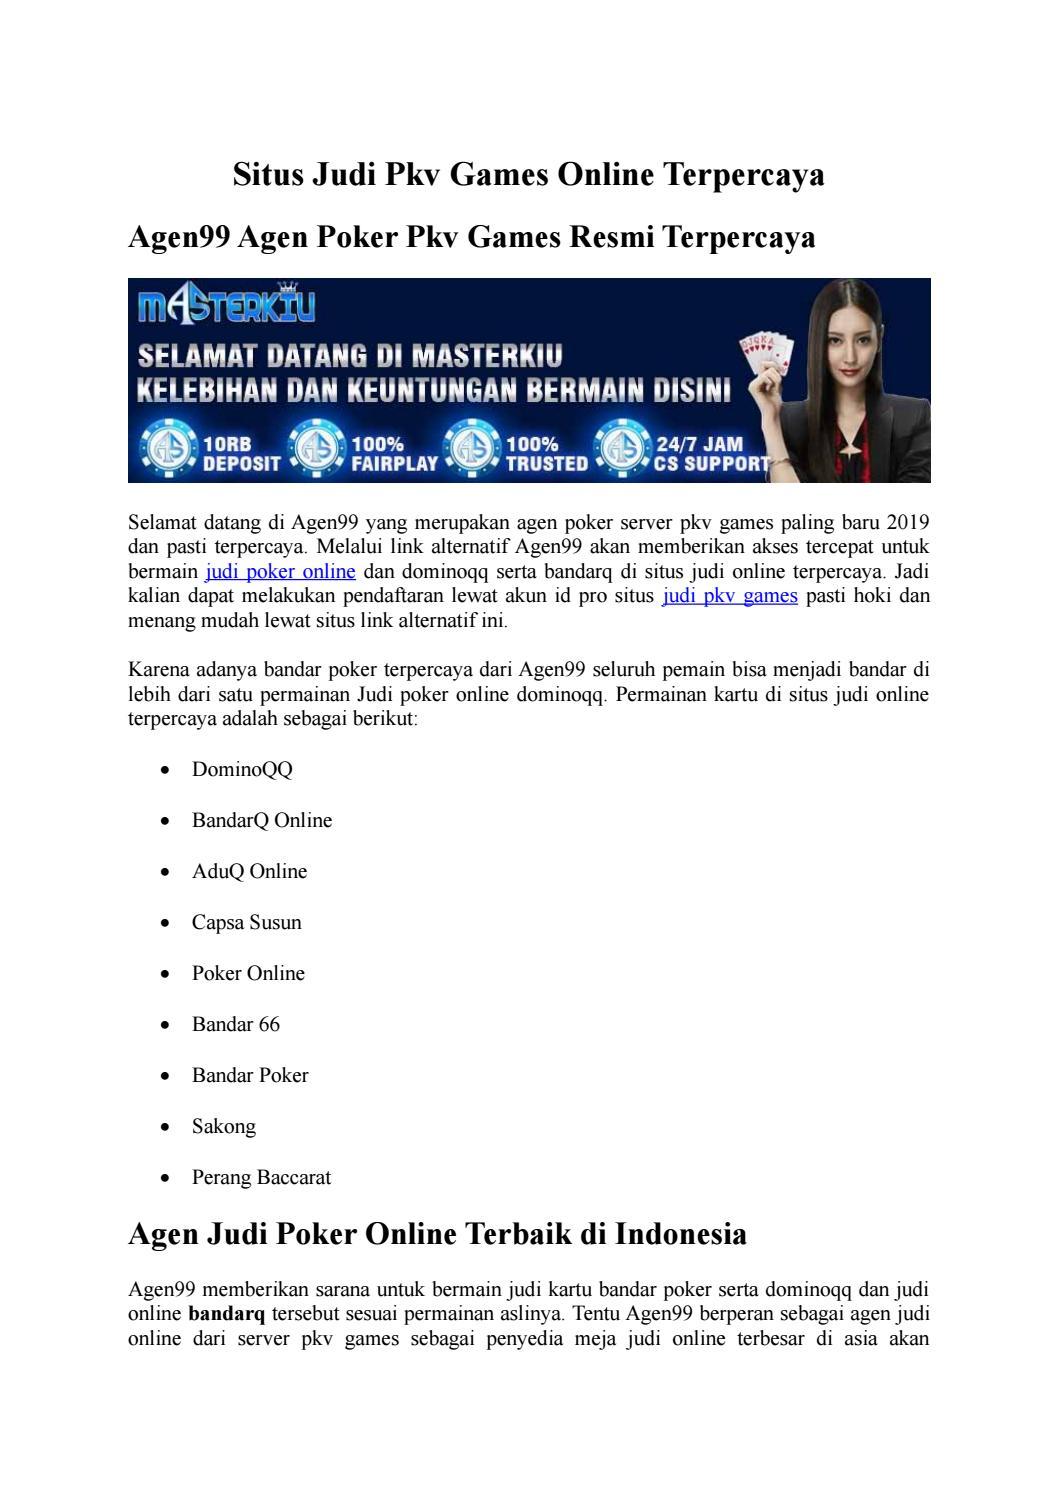 Situs Judi Pkv Games Online Terpercaya By Bandardominoqq Issuu